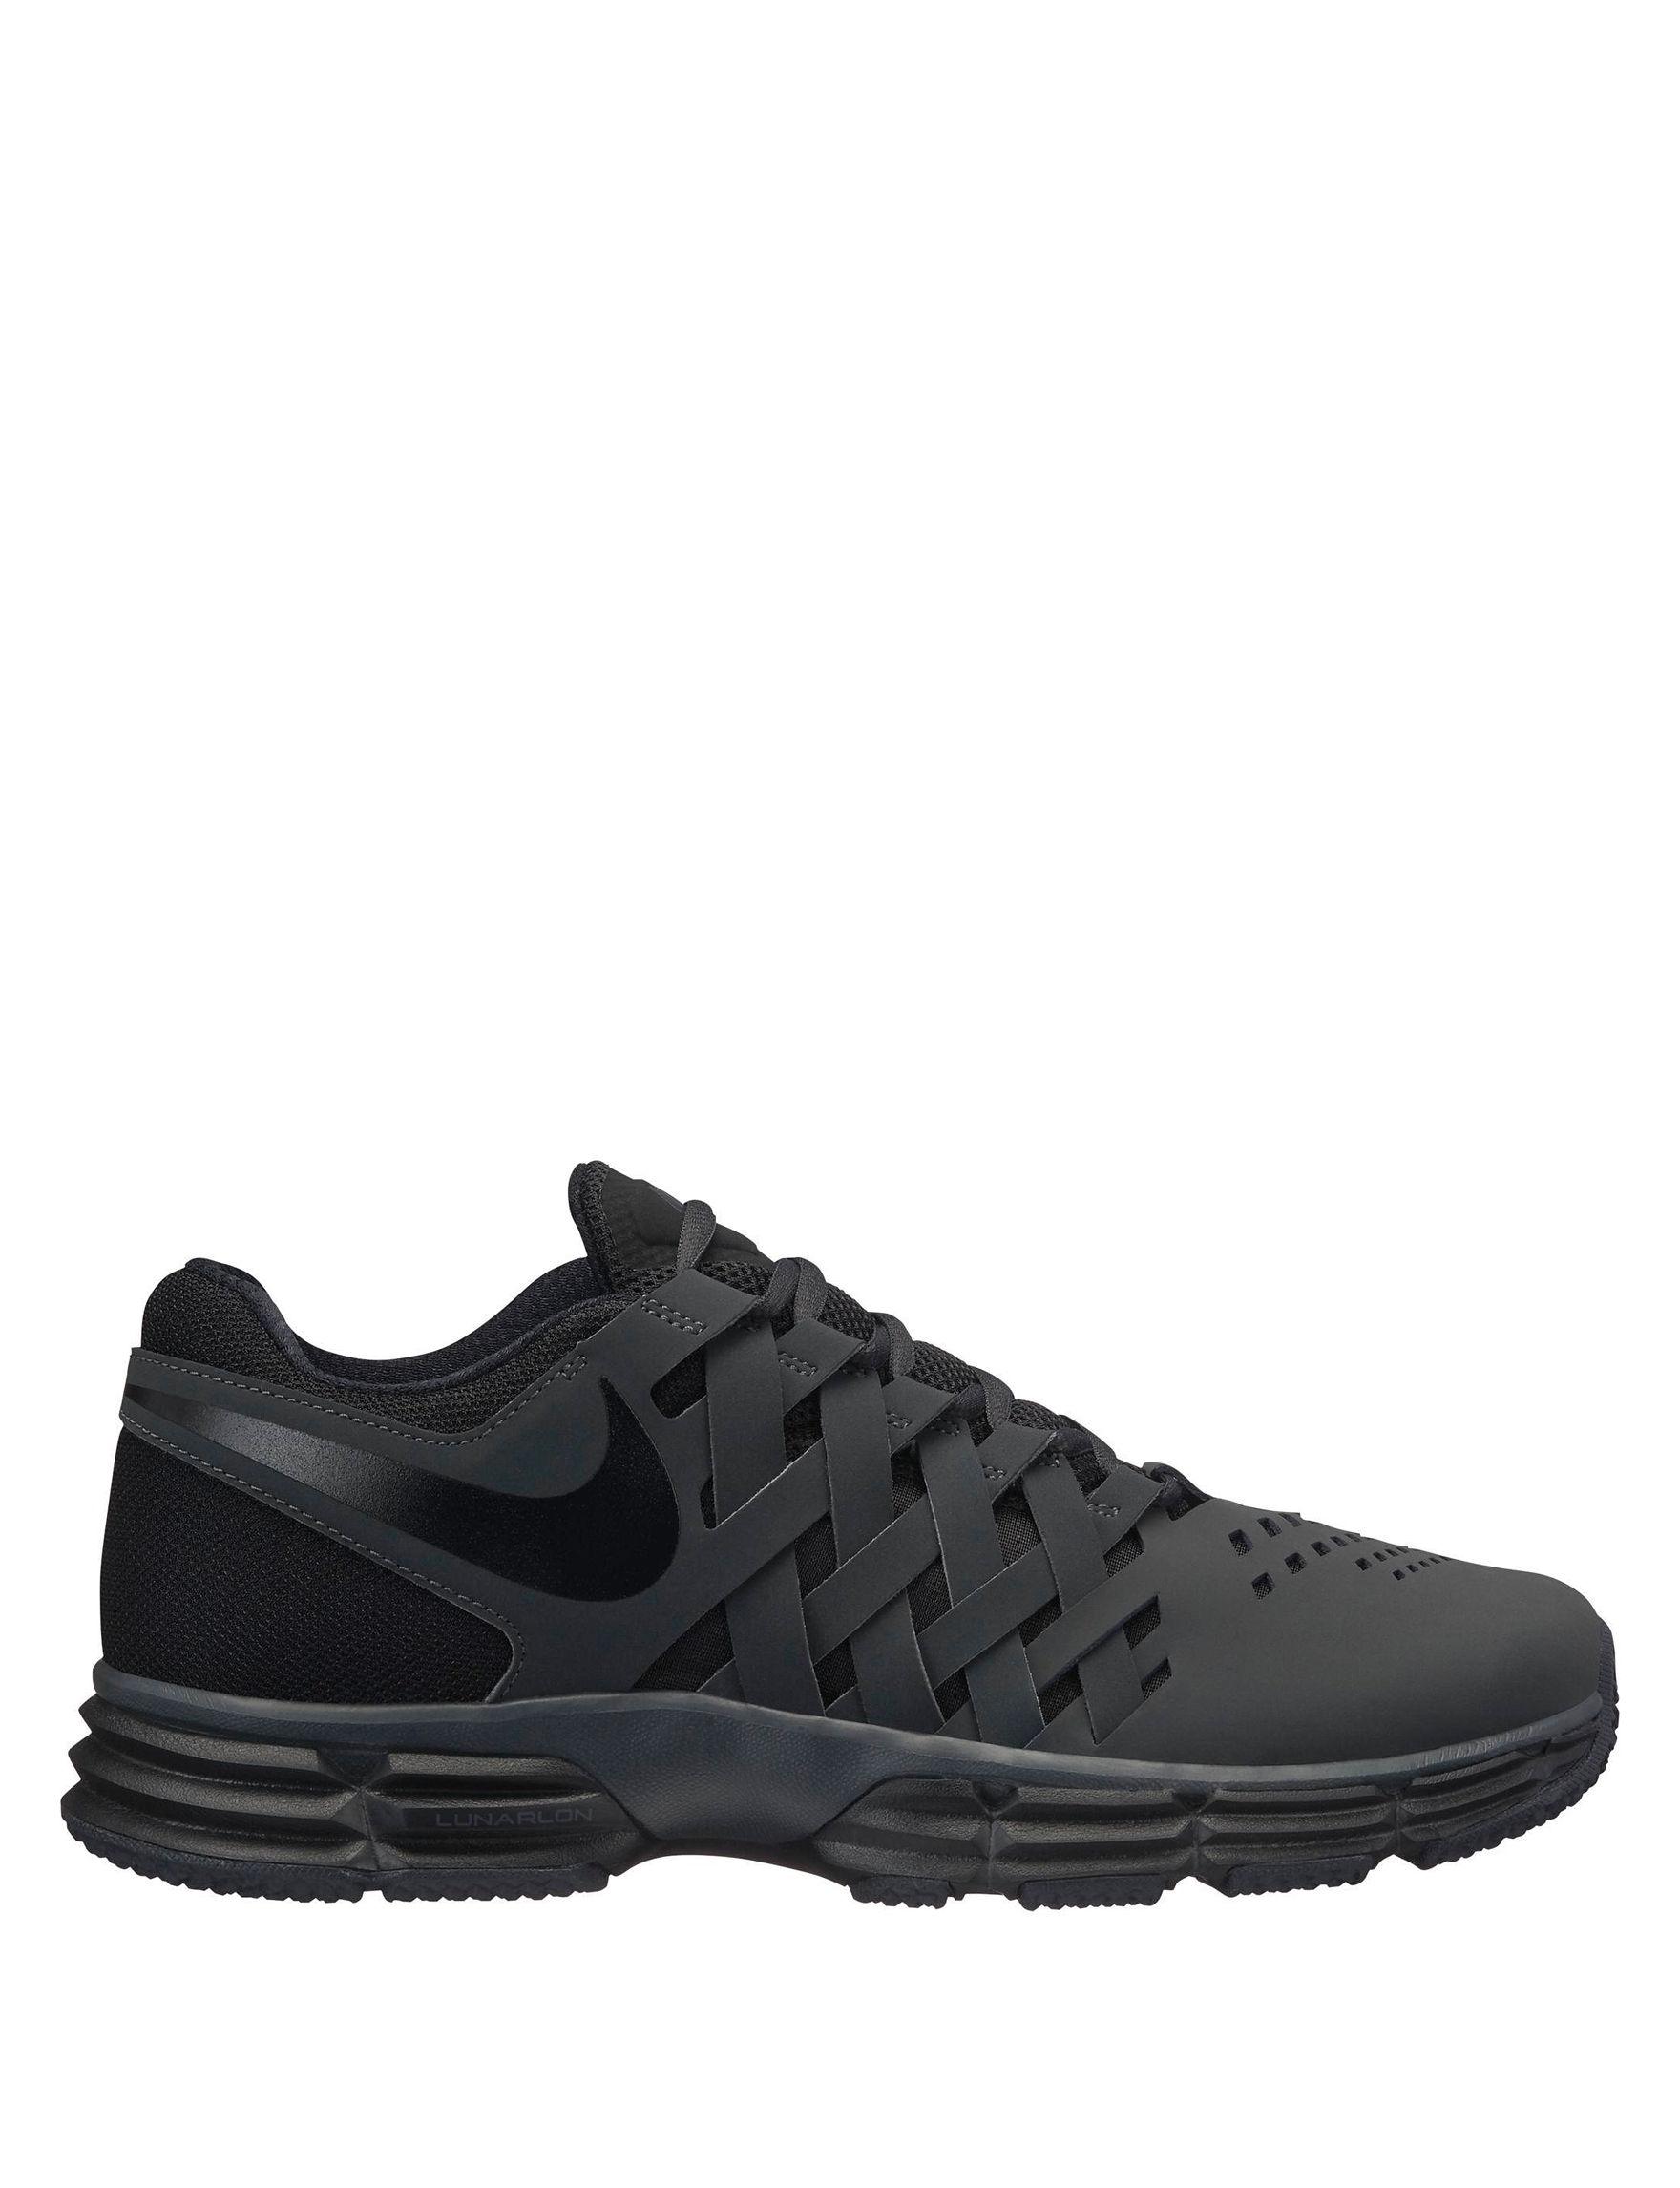 8415790e5f Nike Men's Lunar Fingertrap 4E Training Shoes   Stage Stores